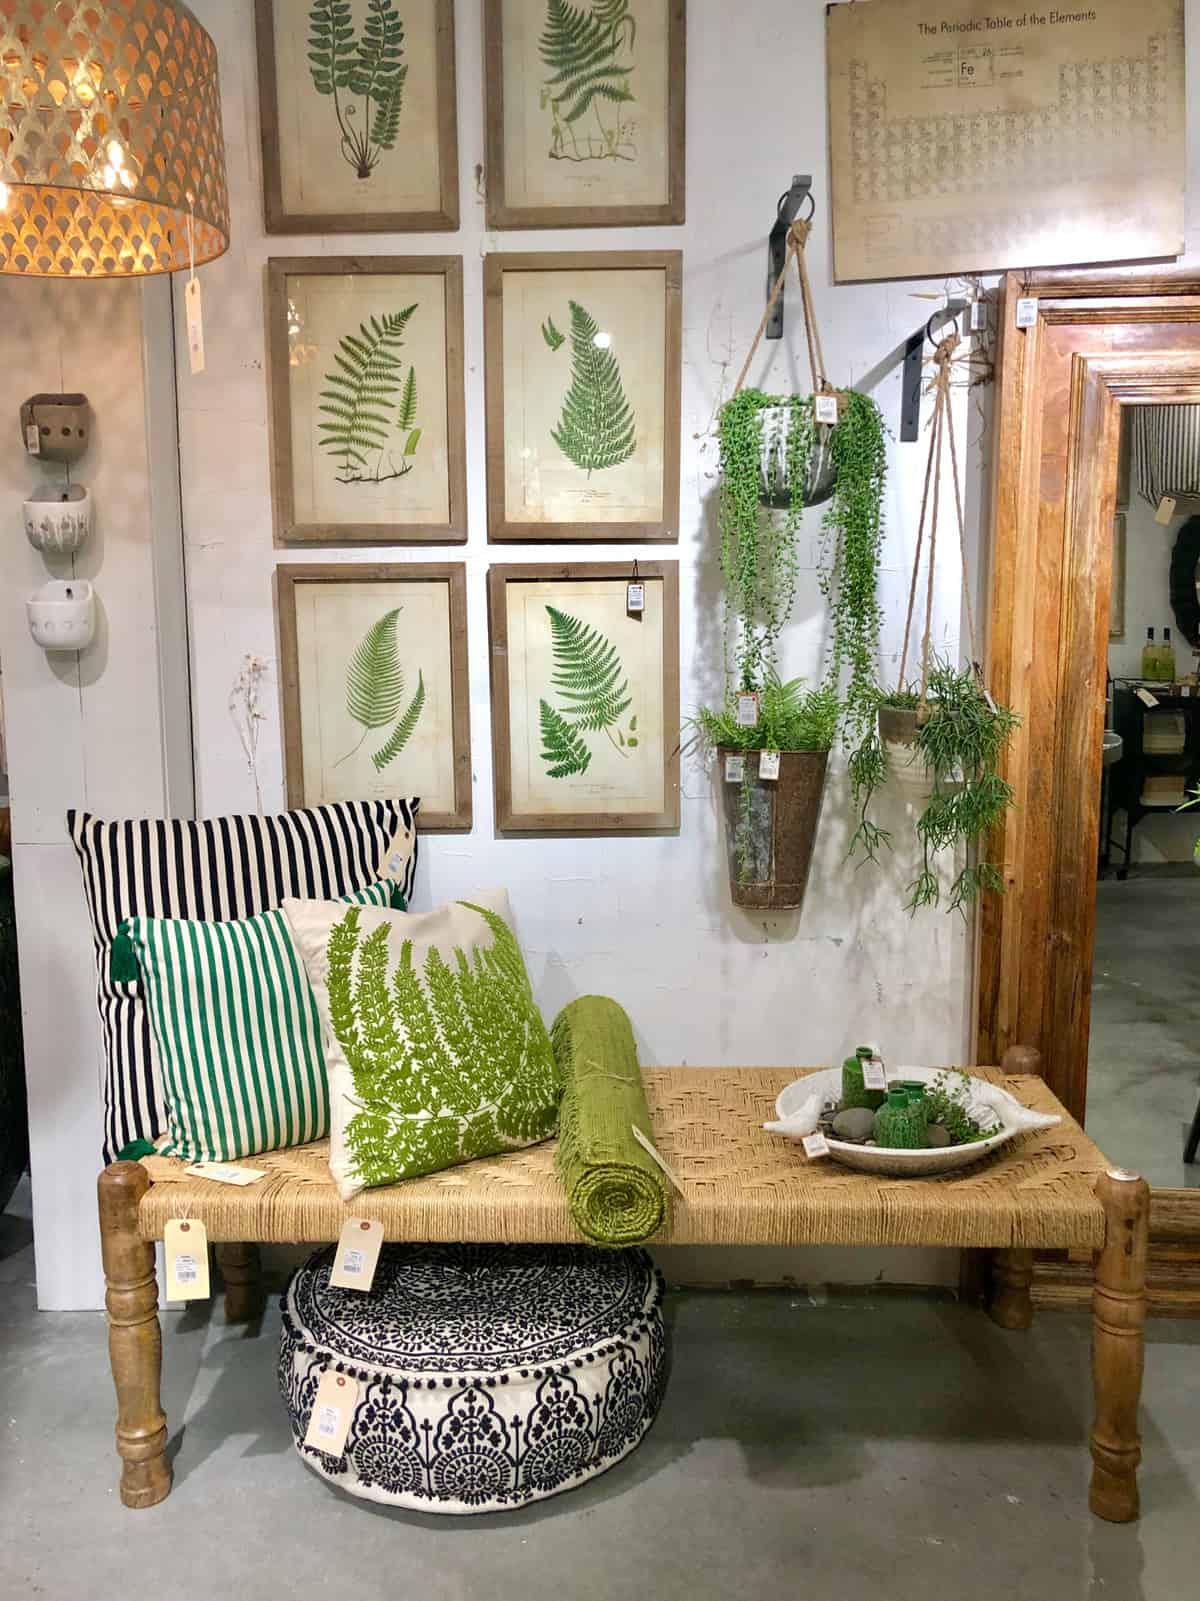 napa home and garden wares at americas mart